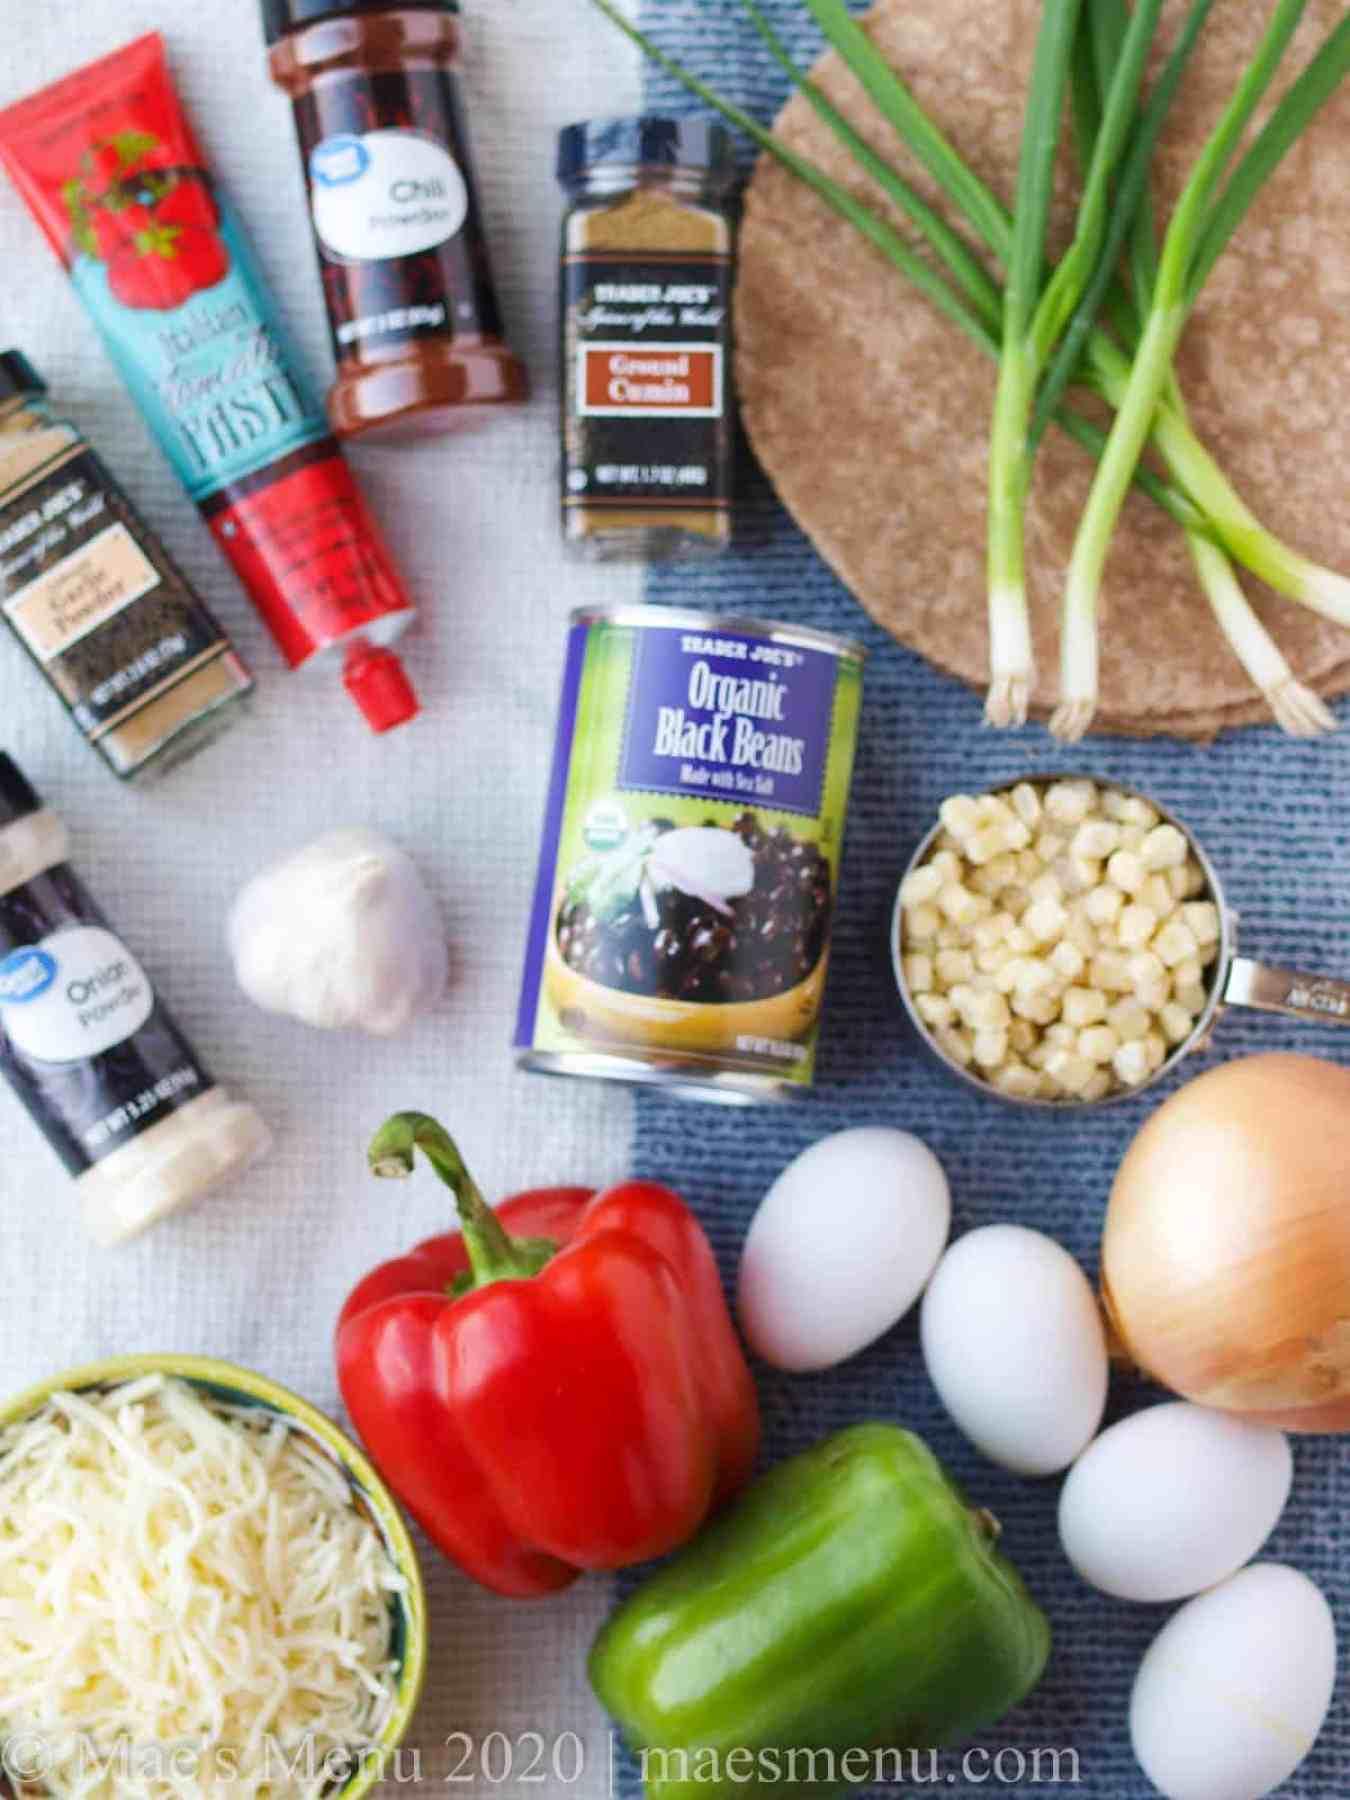 All the ingredients needed for Black Bean Breakfast Enchiladas.